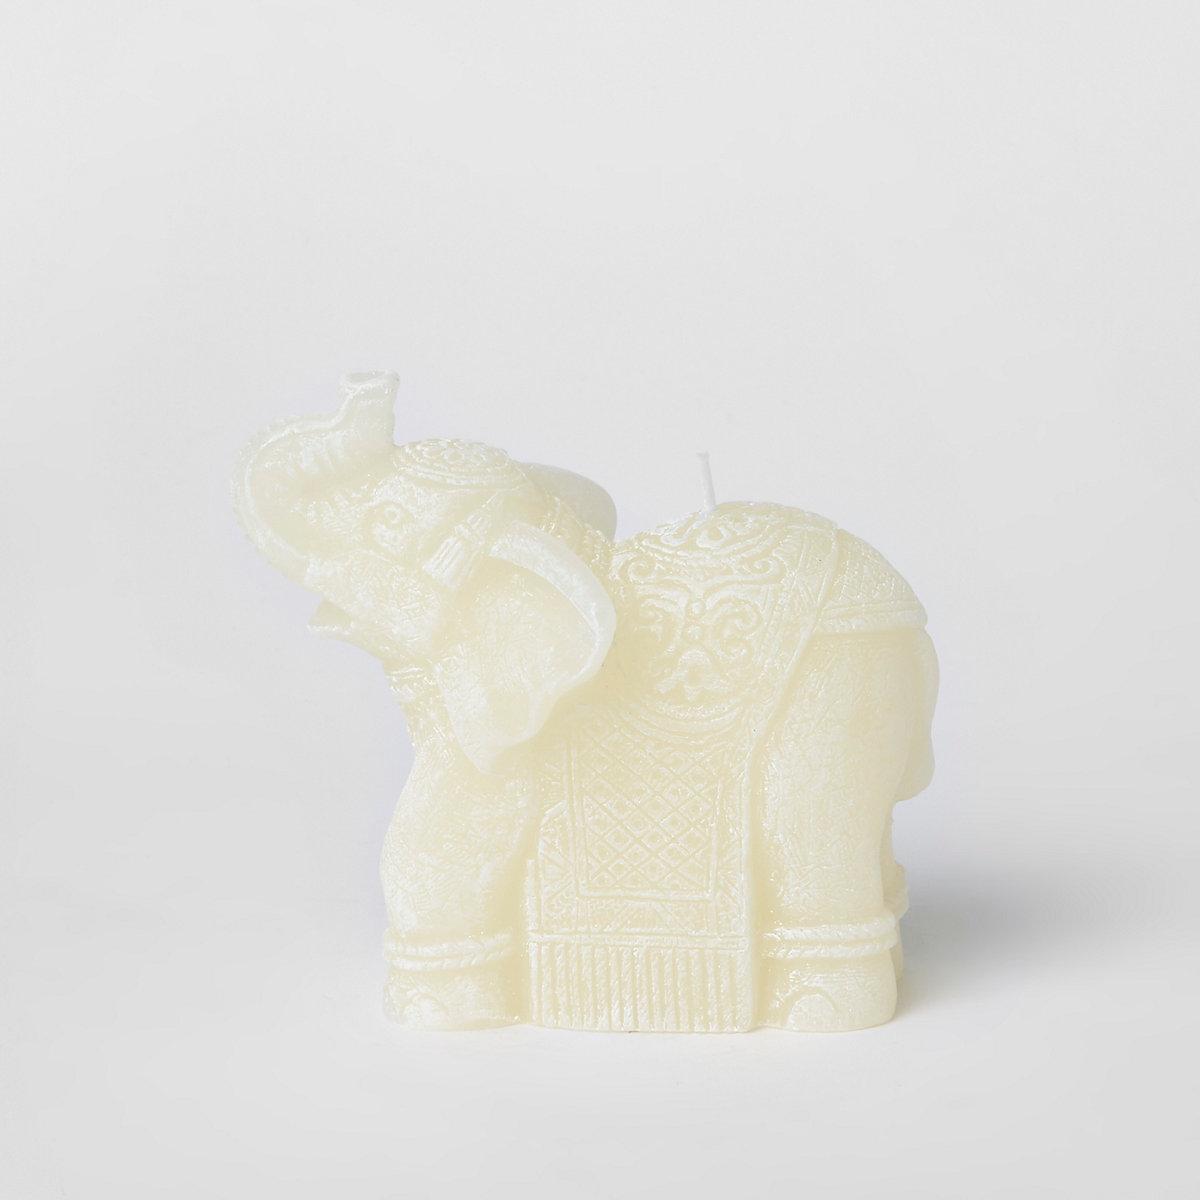 White elephant wax candle